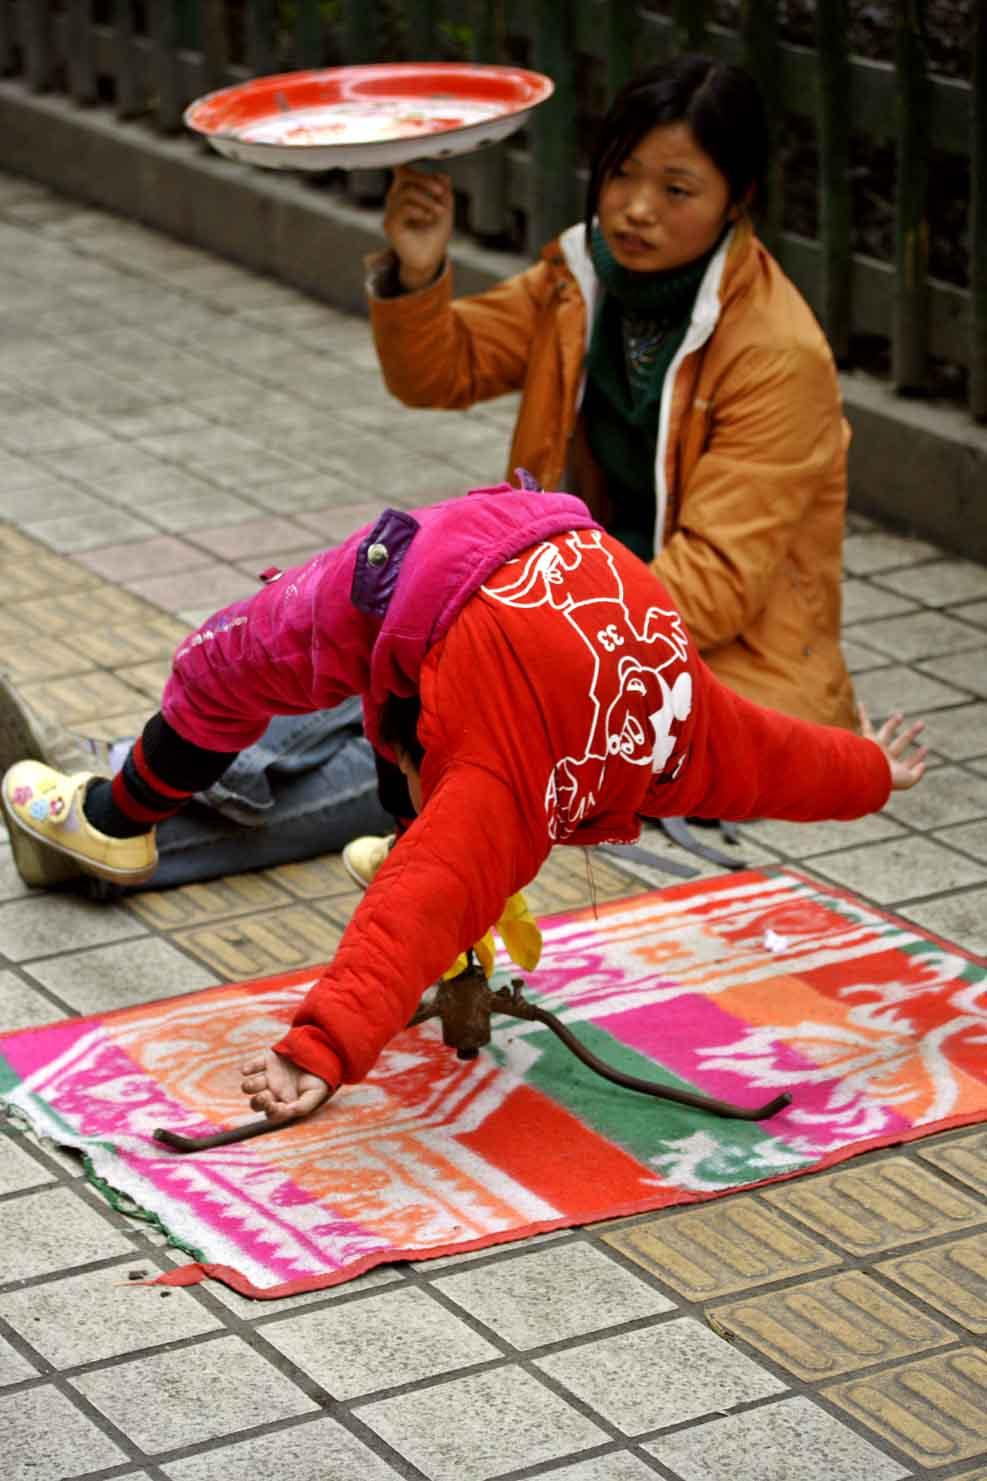 Girl spinning while balancing on mouth. Jishou City, China.